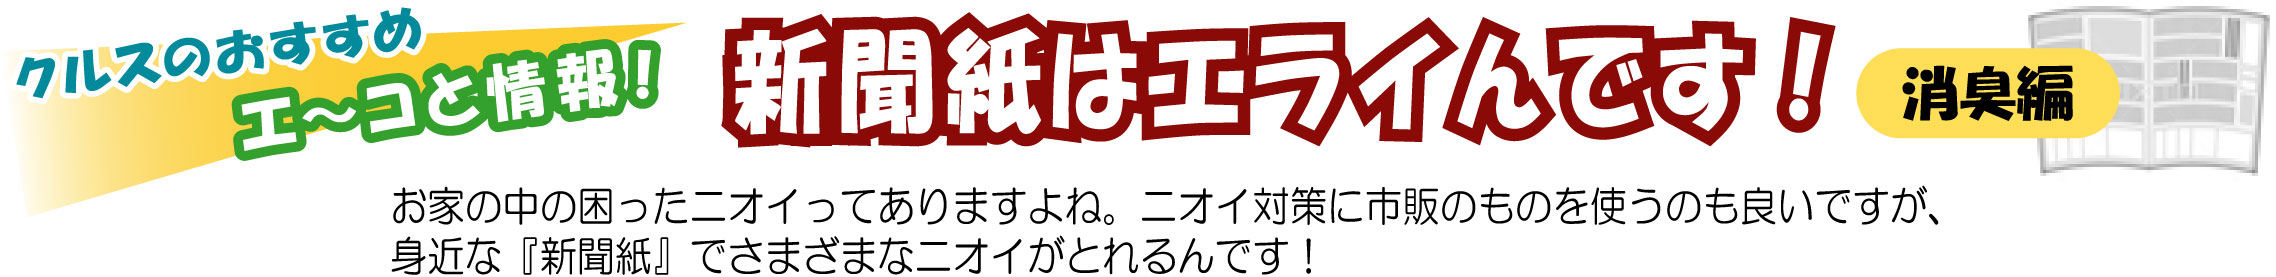 KuraSi-natu-sin68-12.jpg